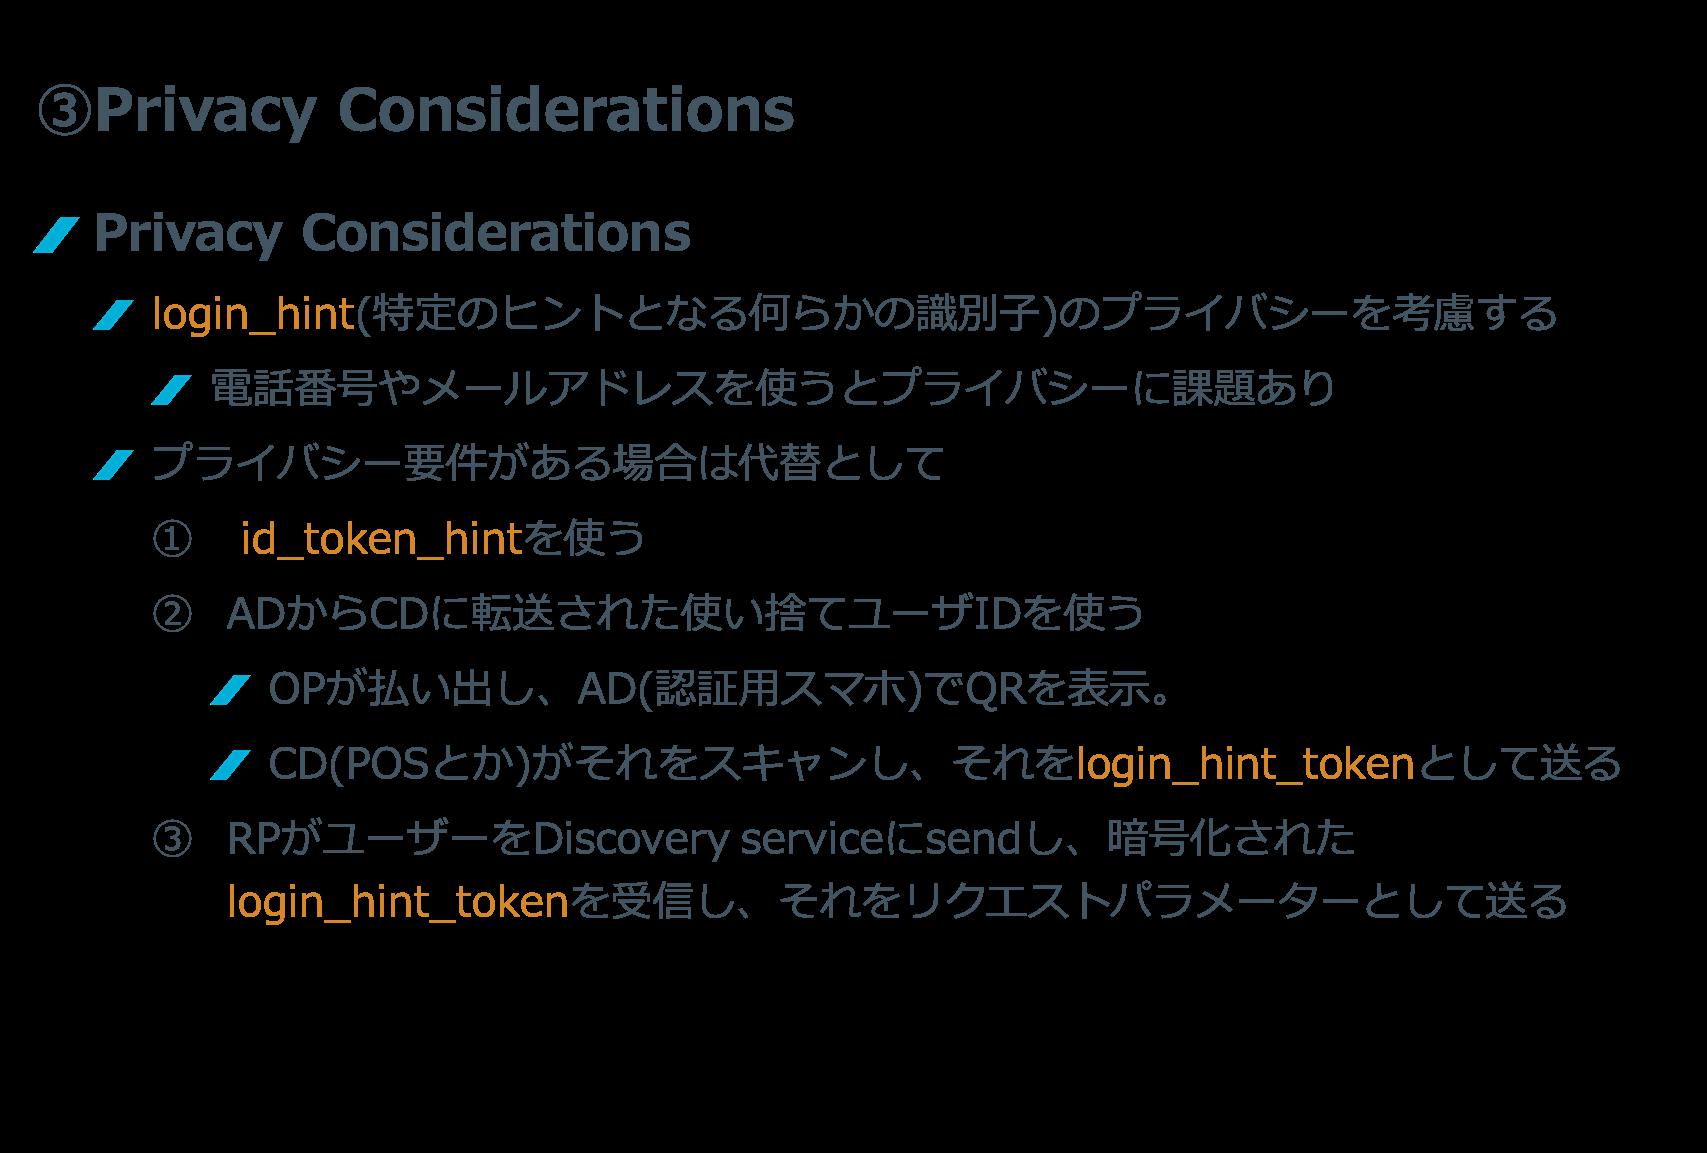 SecureSketCH_PrivacyConsiderations